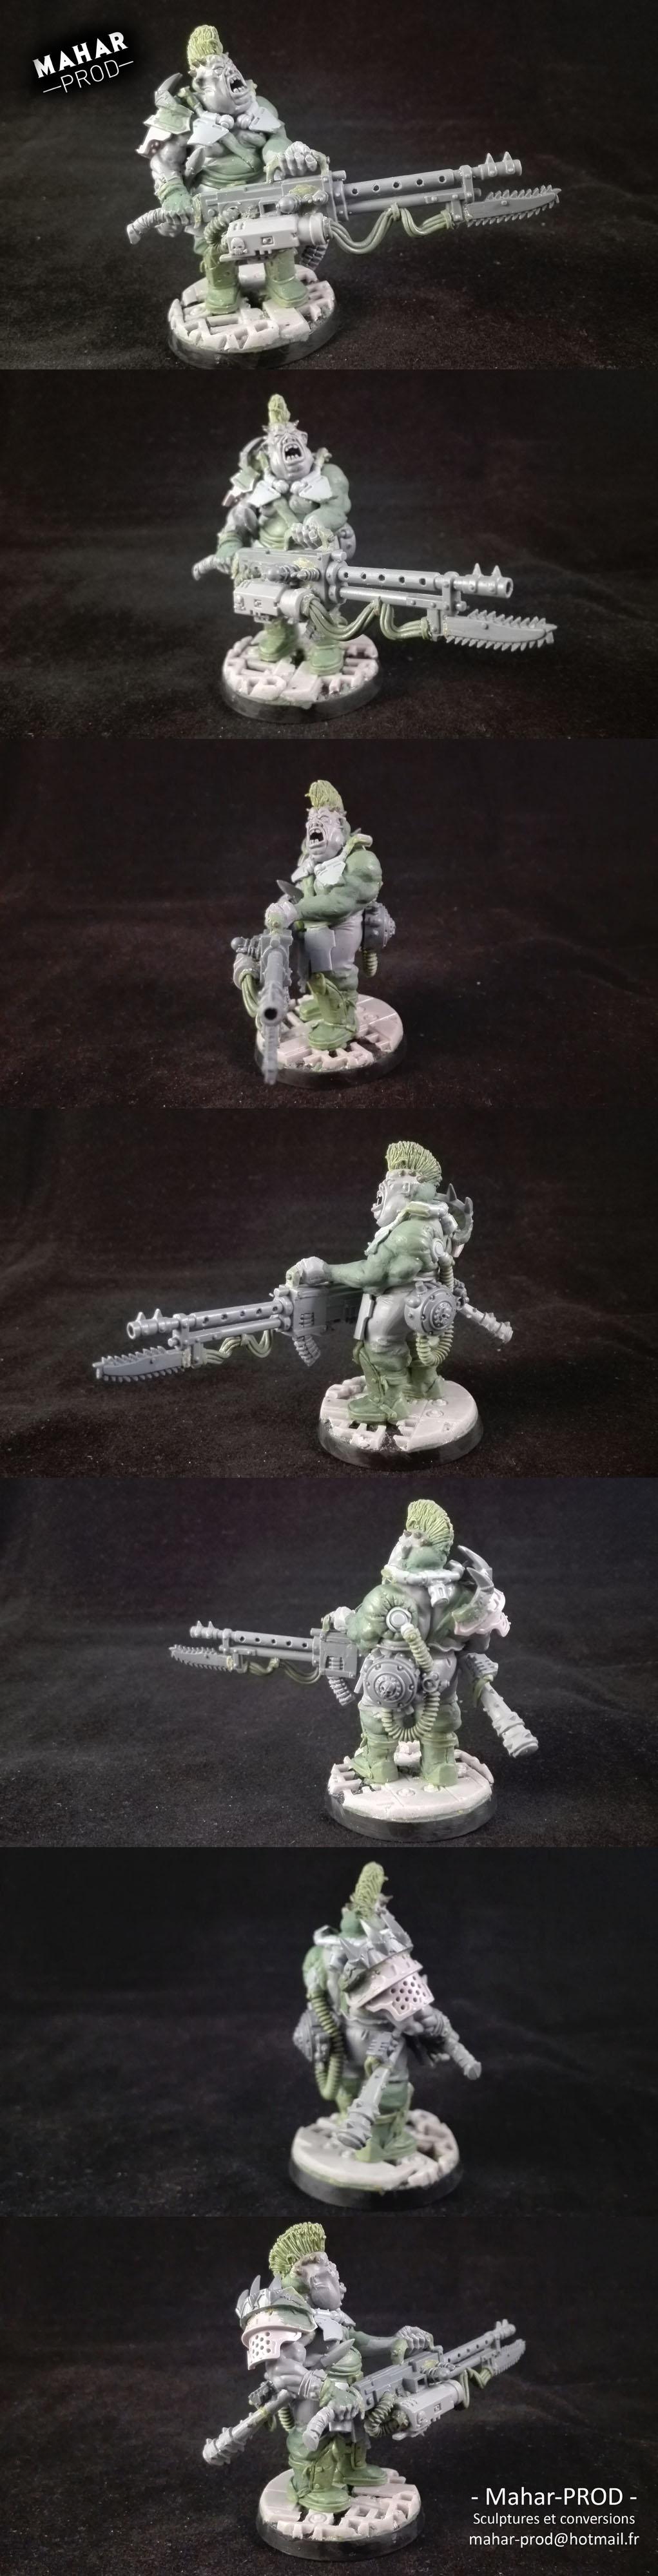 Big Heavy Goliath for Necromunda by Mahar